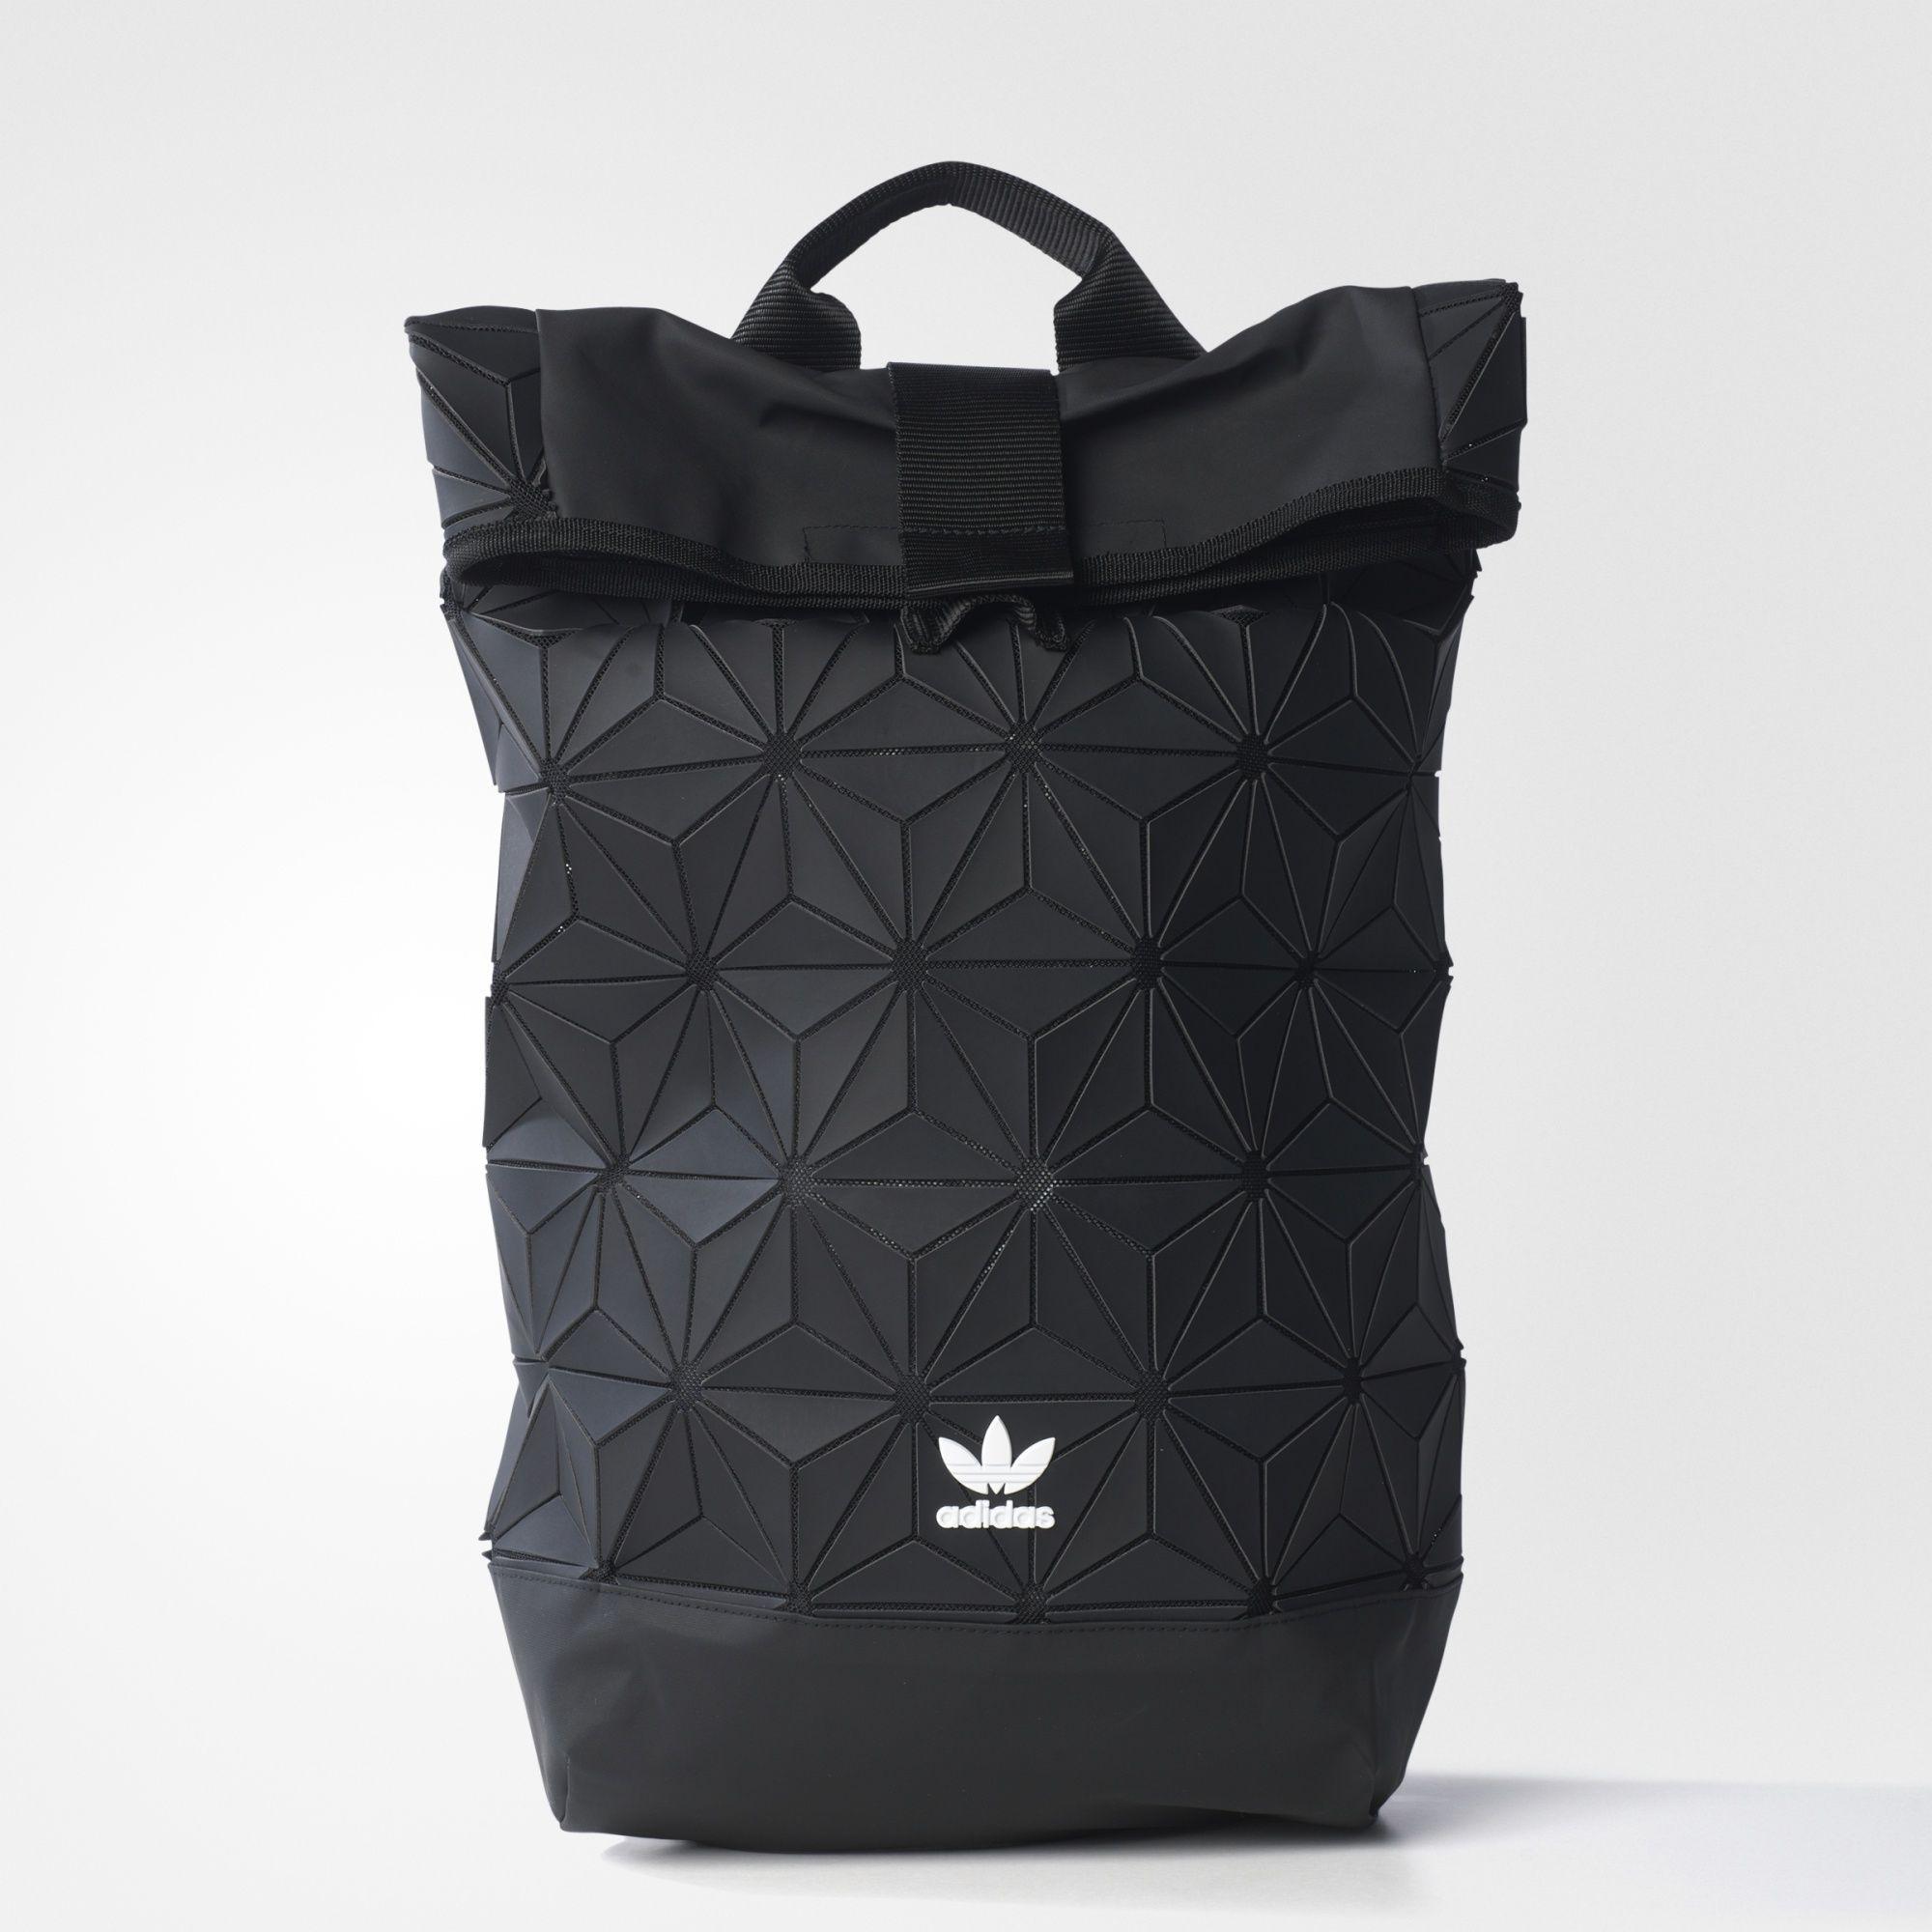 I Love Adidas BackpackAccessories Bolsos Urban Hombre Para ZiPXTOku